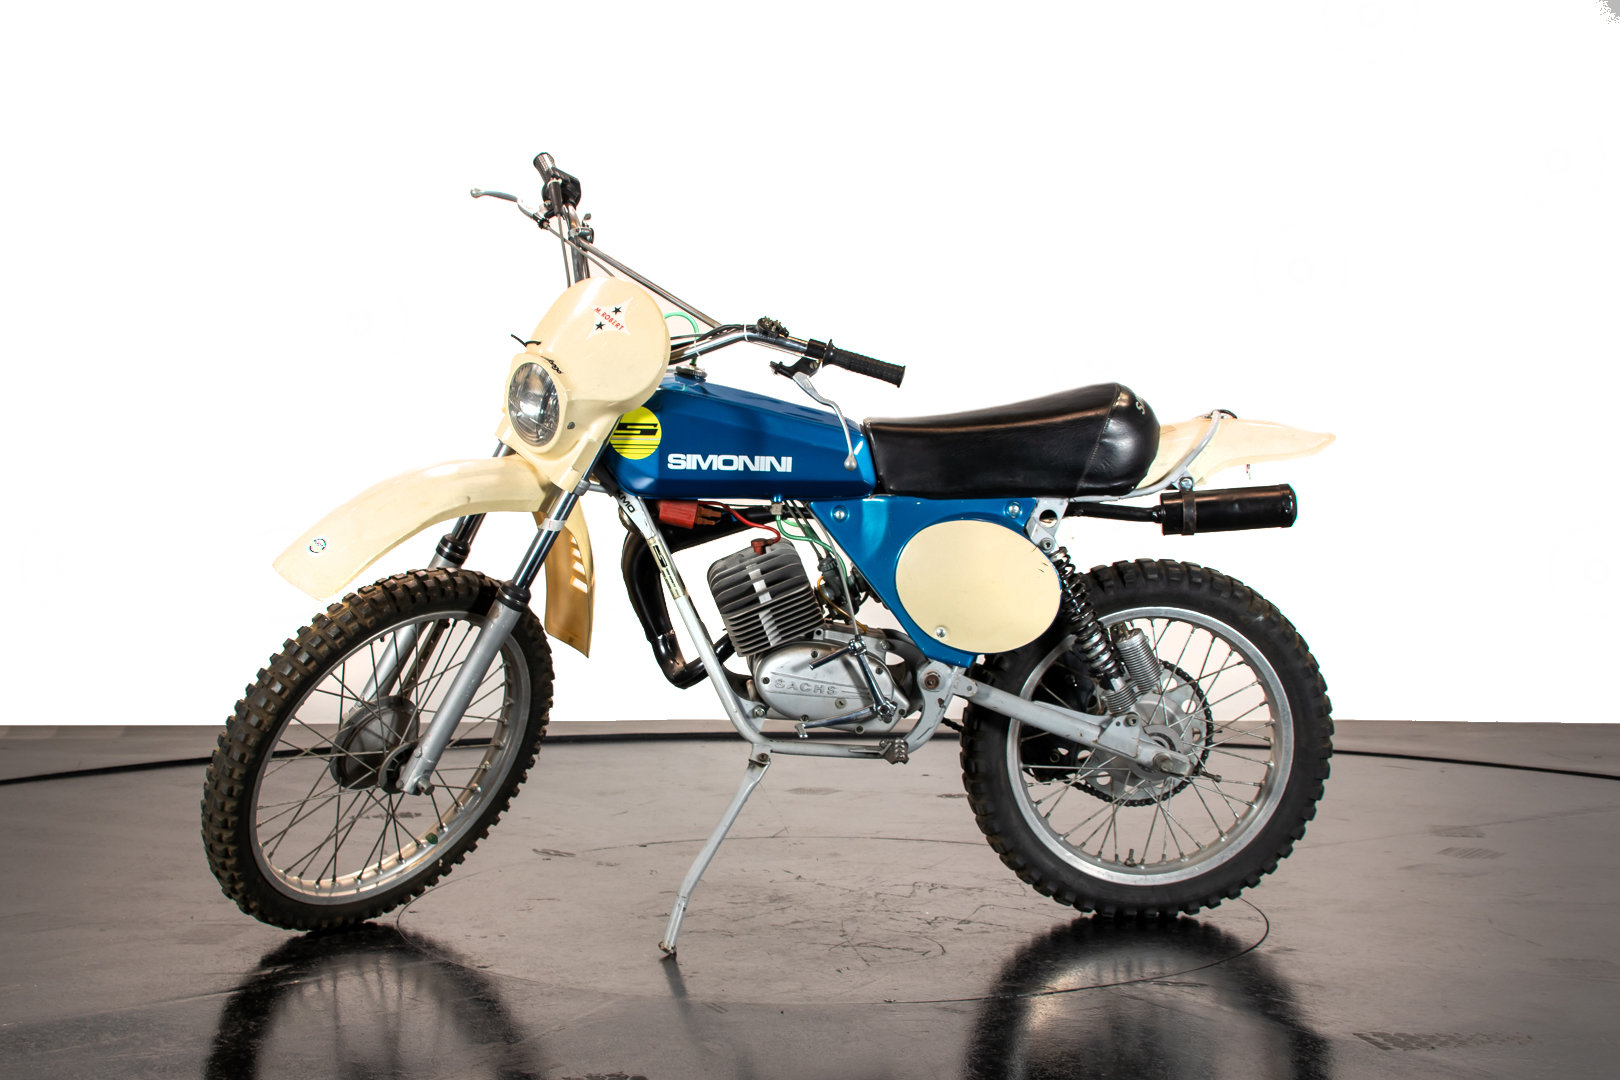 SIMONINI - S-S - 1977 For Sale (picture 1 of 8)